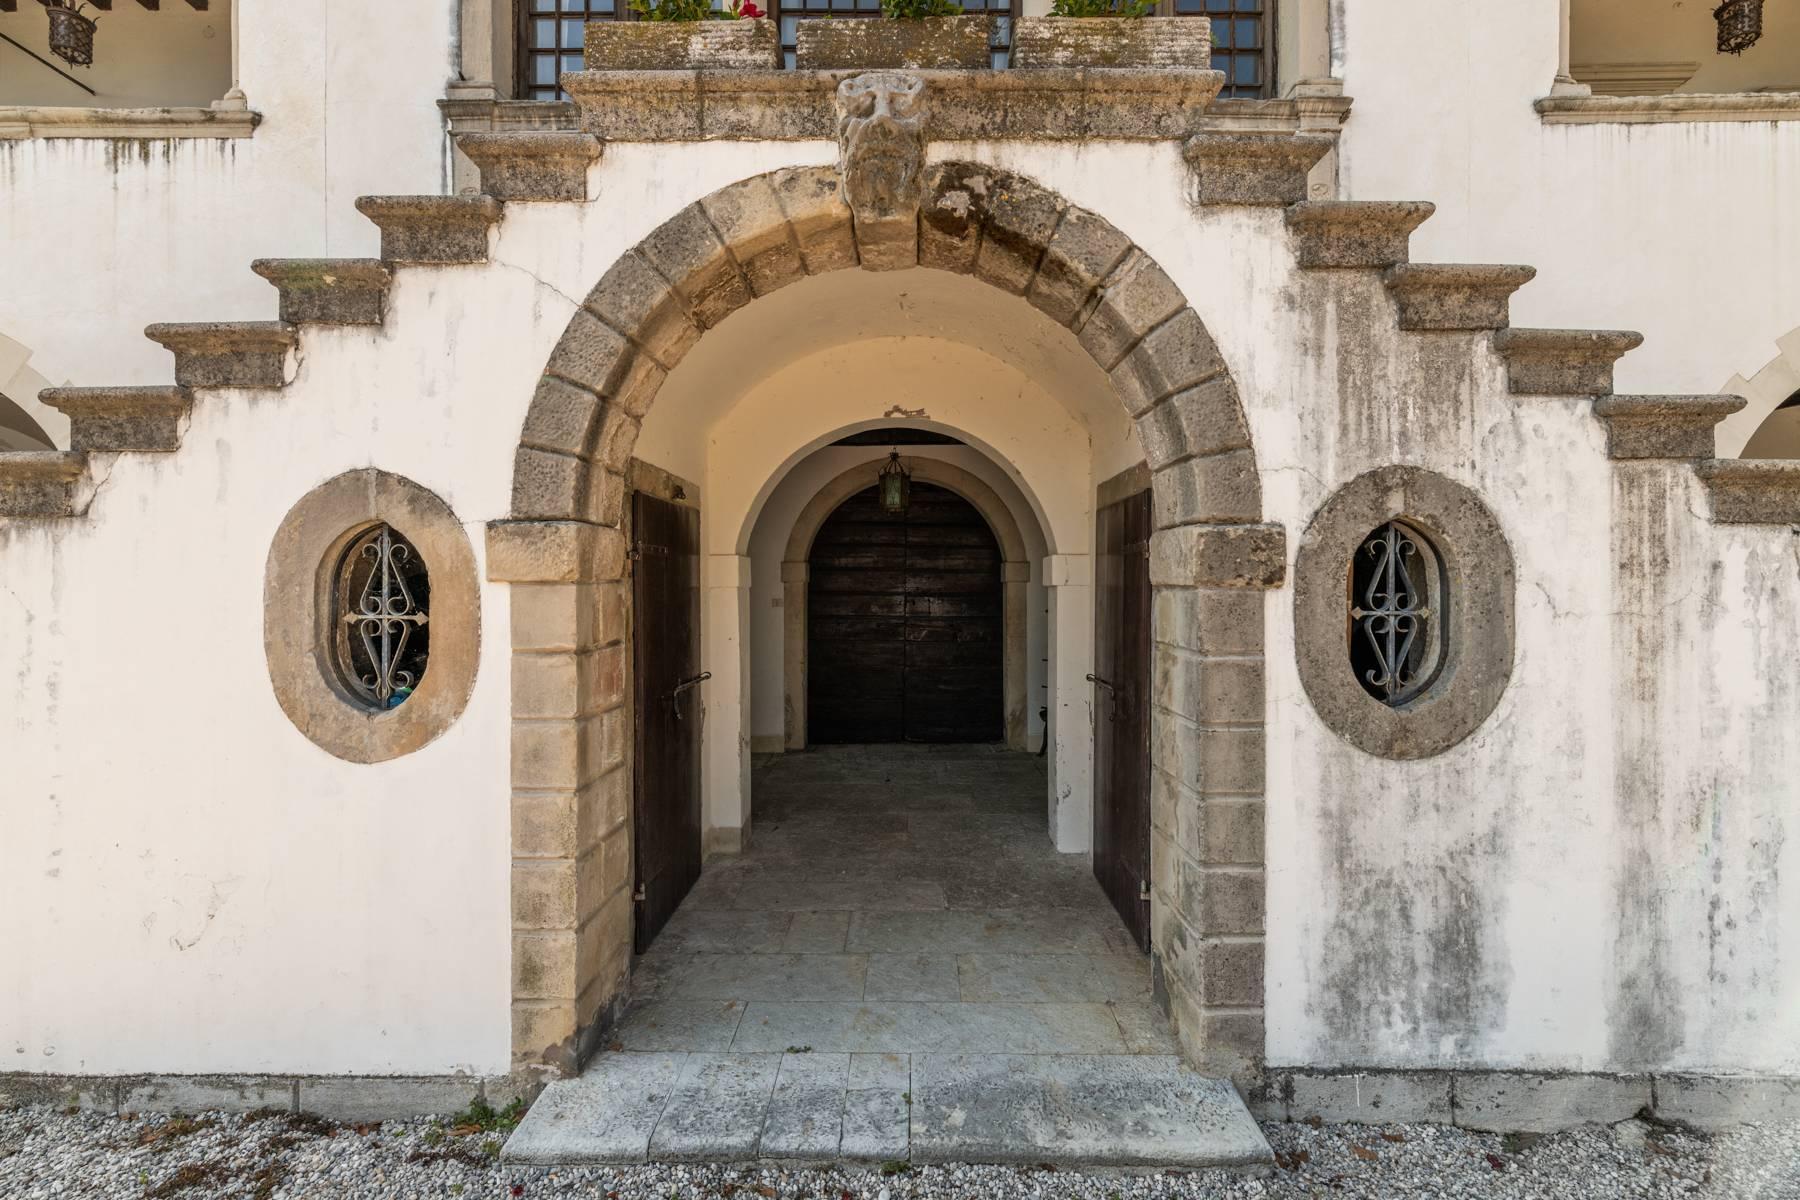 Elegant 17th century Venetian Villa with park on the hills of Treviso - 33